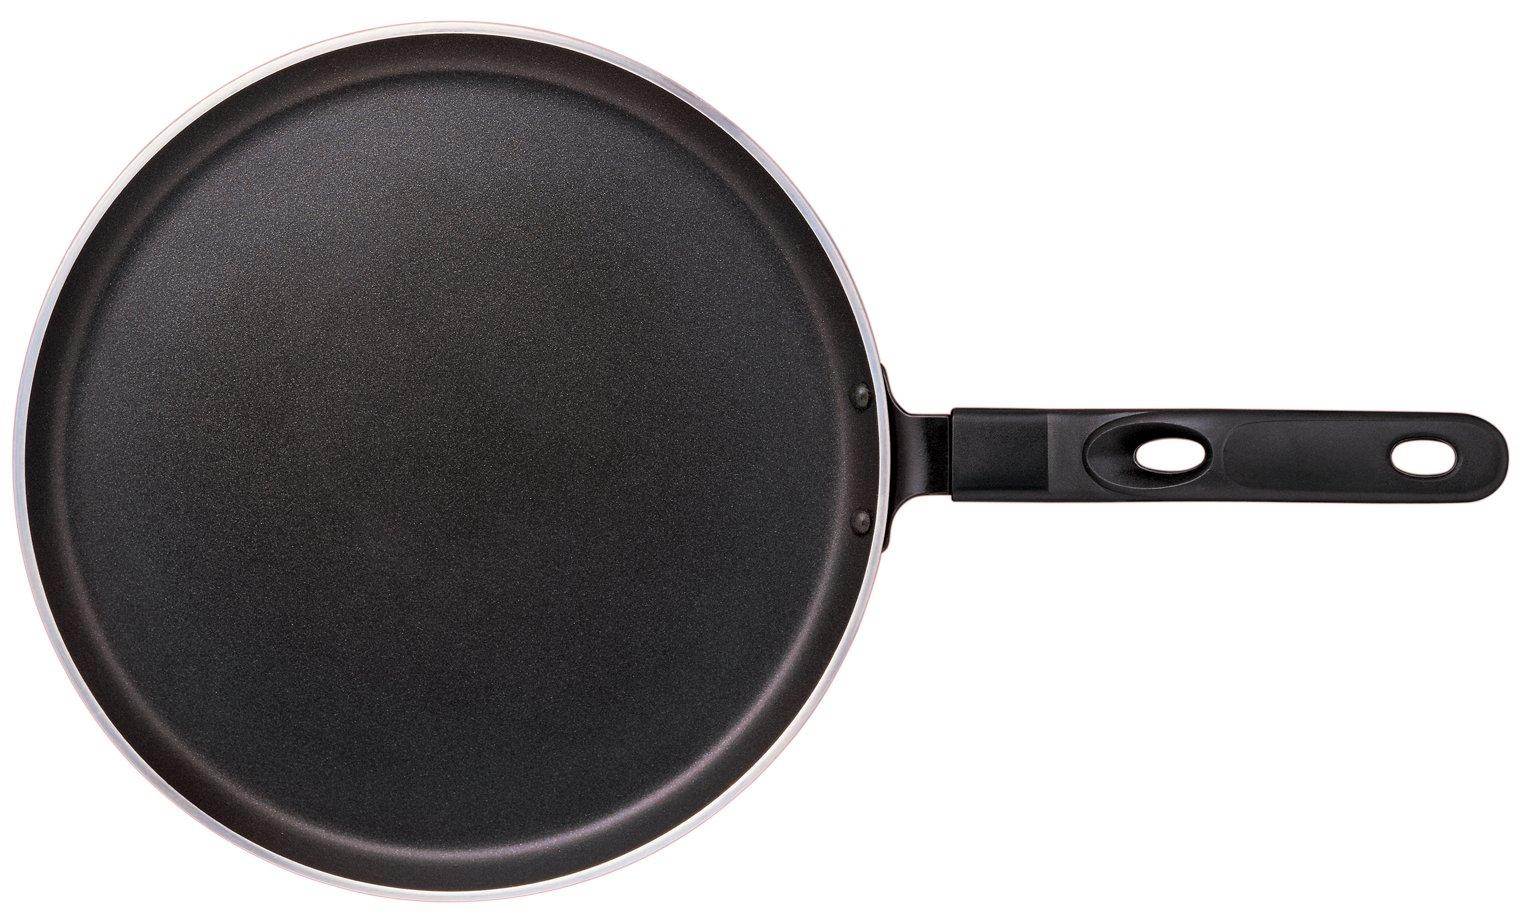 Nirali 11 inch Flat bottom crepe/pancake/dosa / chapatti pan with Teflon Platinum non-stick coating, black